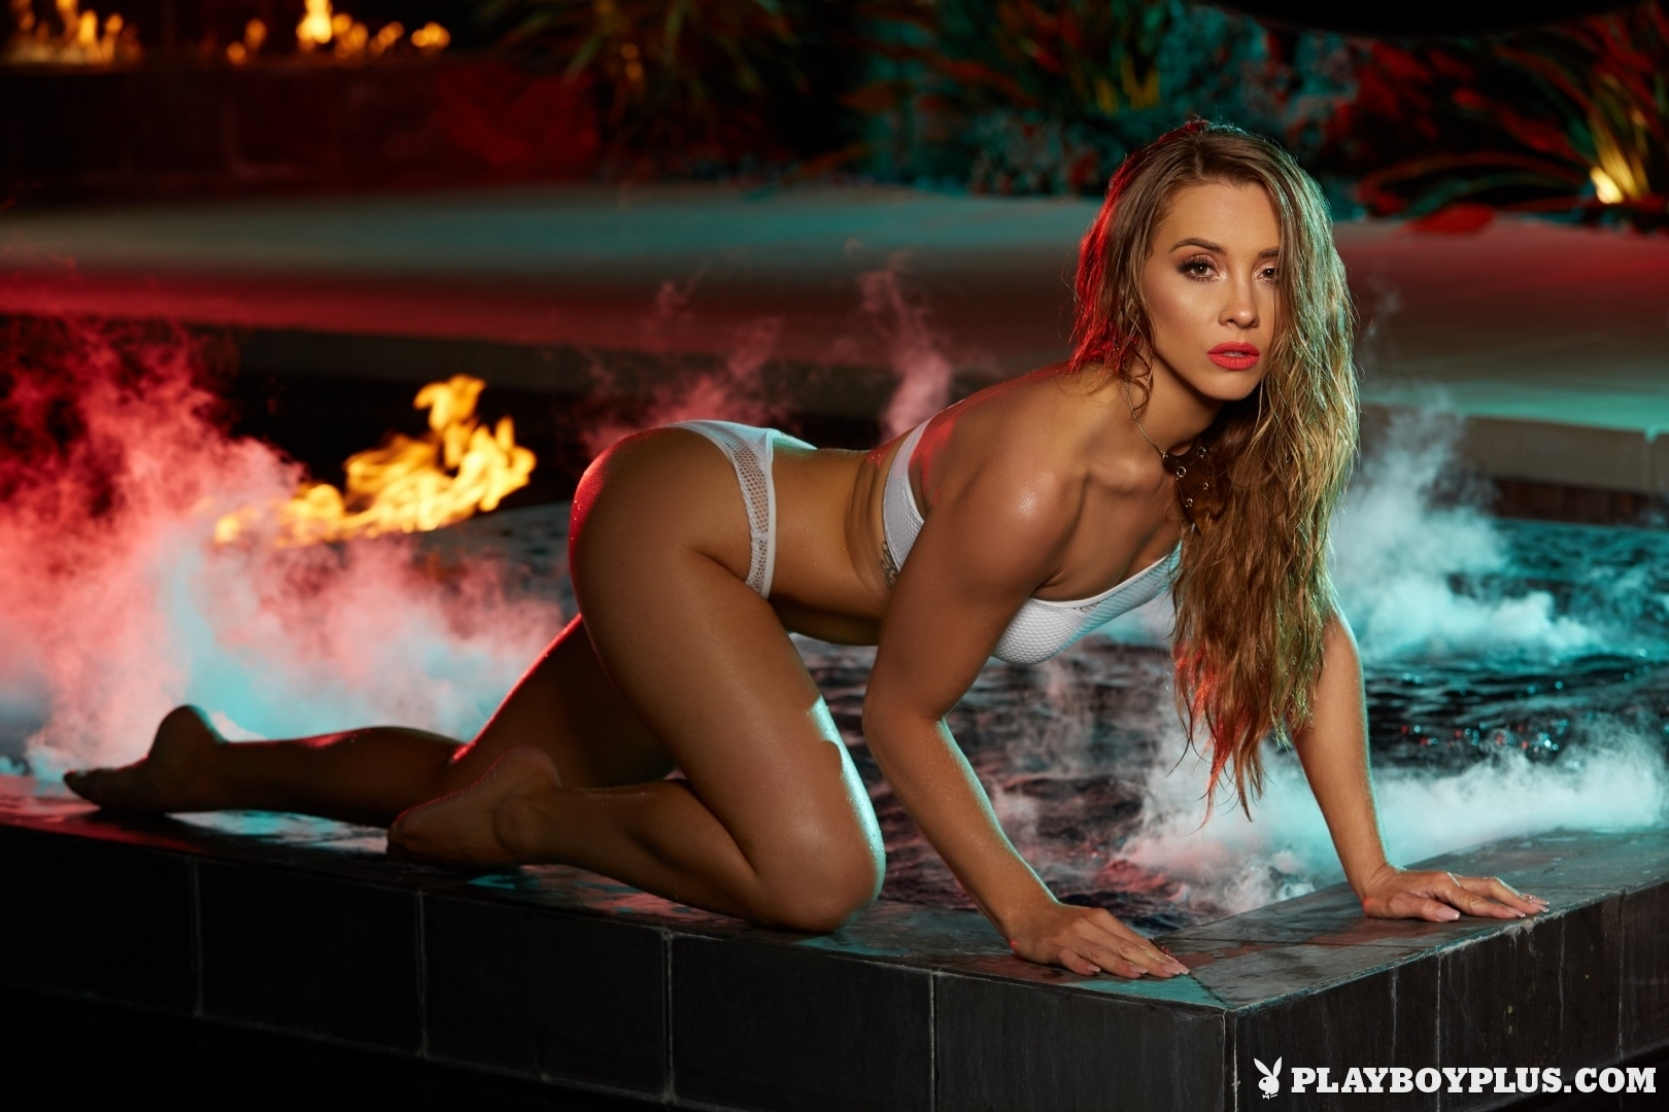 Playboy Plus | Lauryn Elaine in Picking up Steam 4